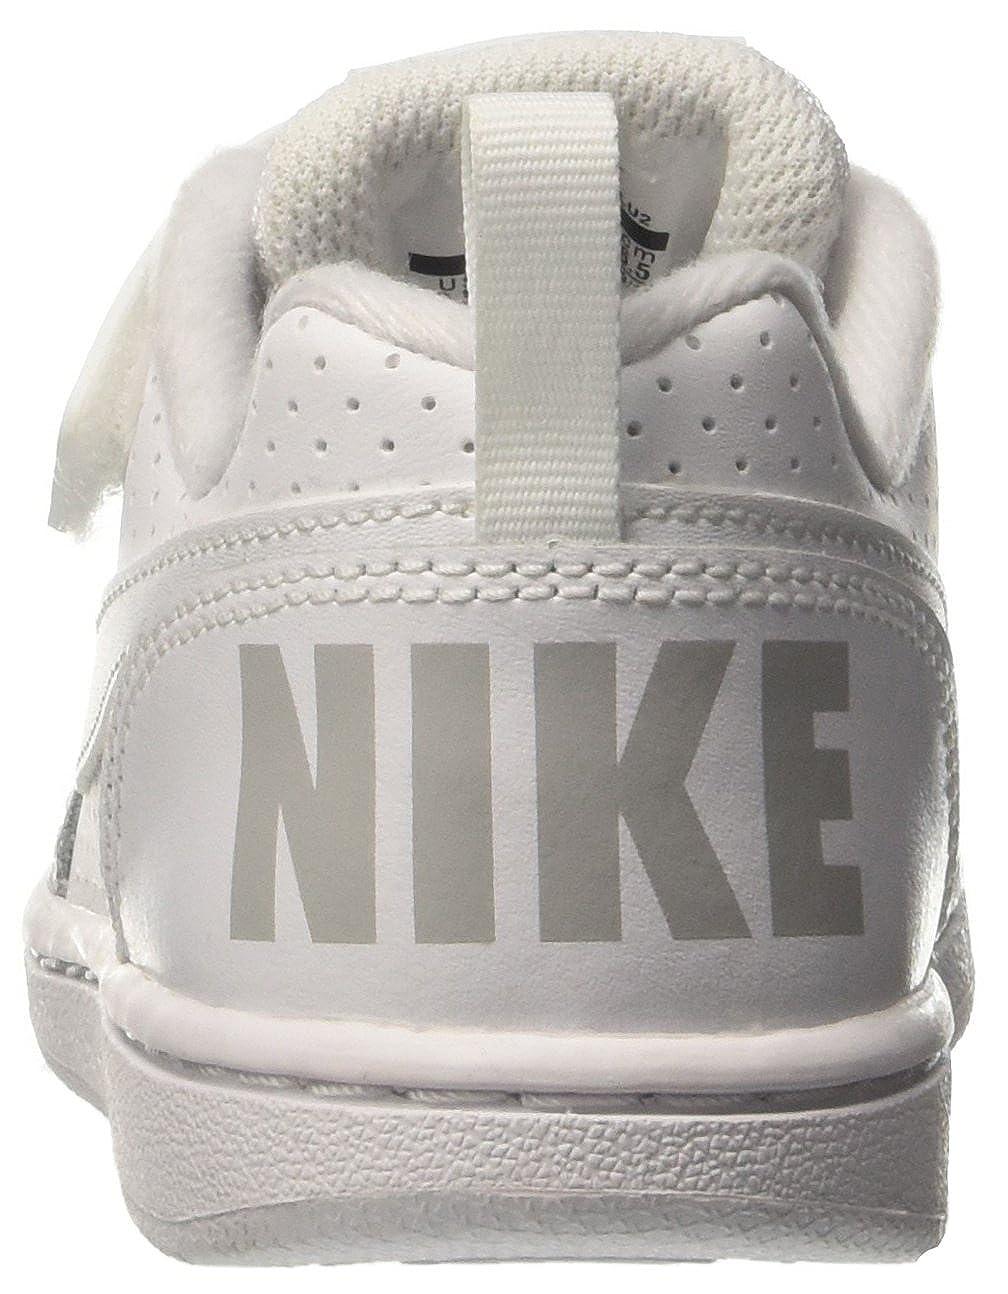 Zapatillas de Baloncesto para Ni/ños PSV Nike Court Borough Low